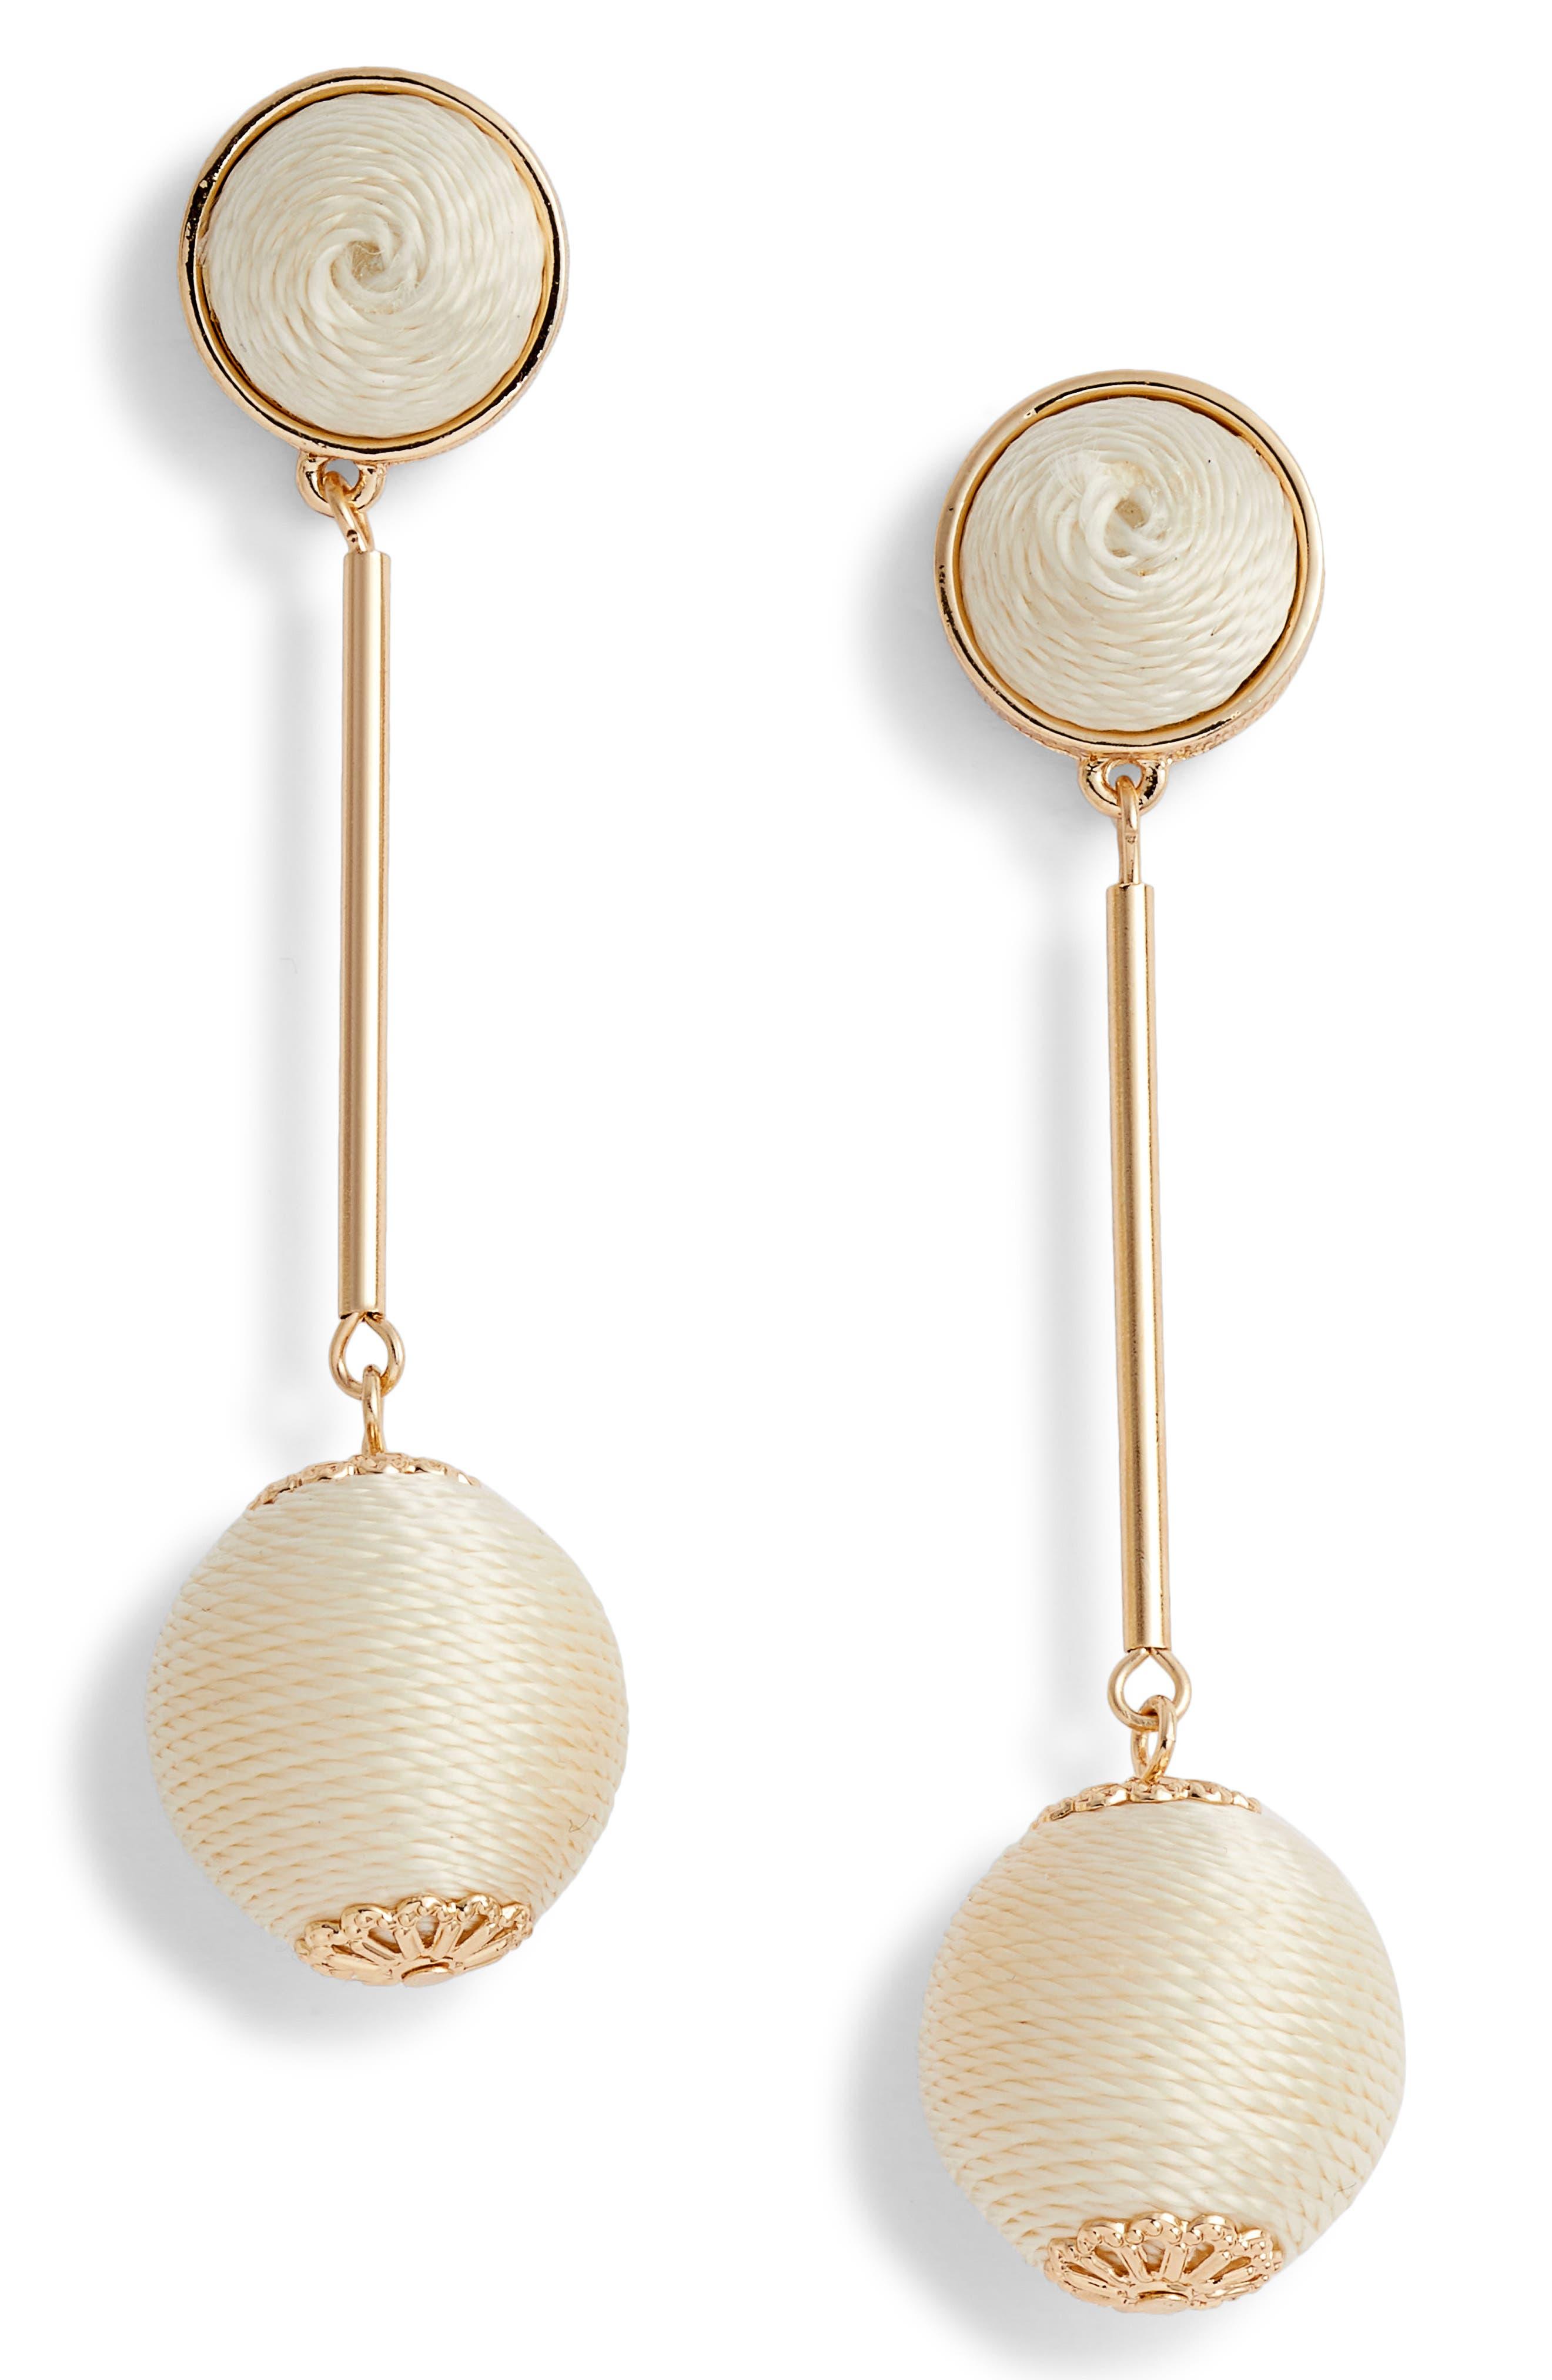 Mod Ball Drop Earrings,                         Main,                         color, 100